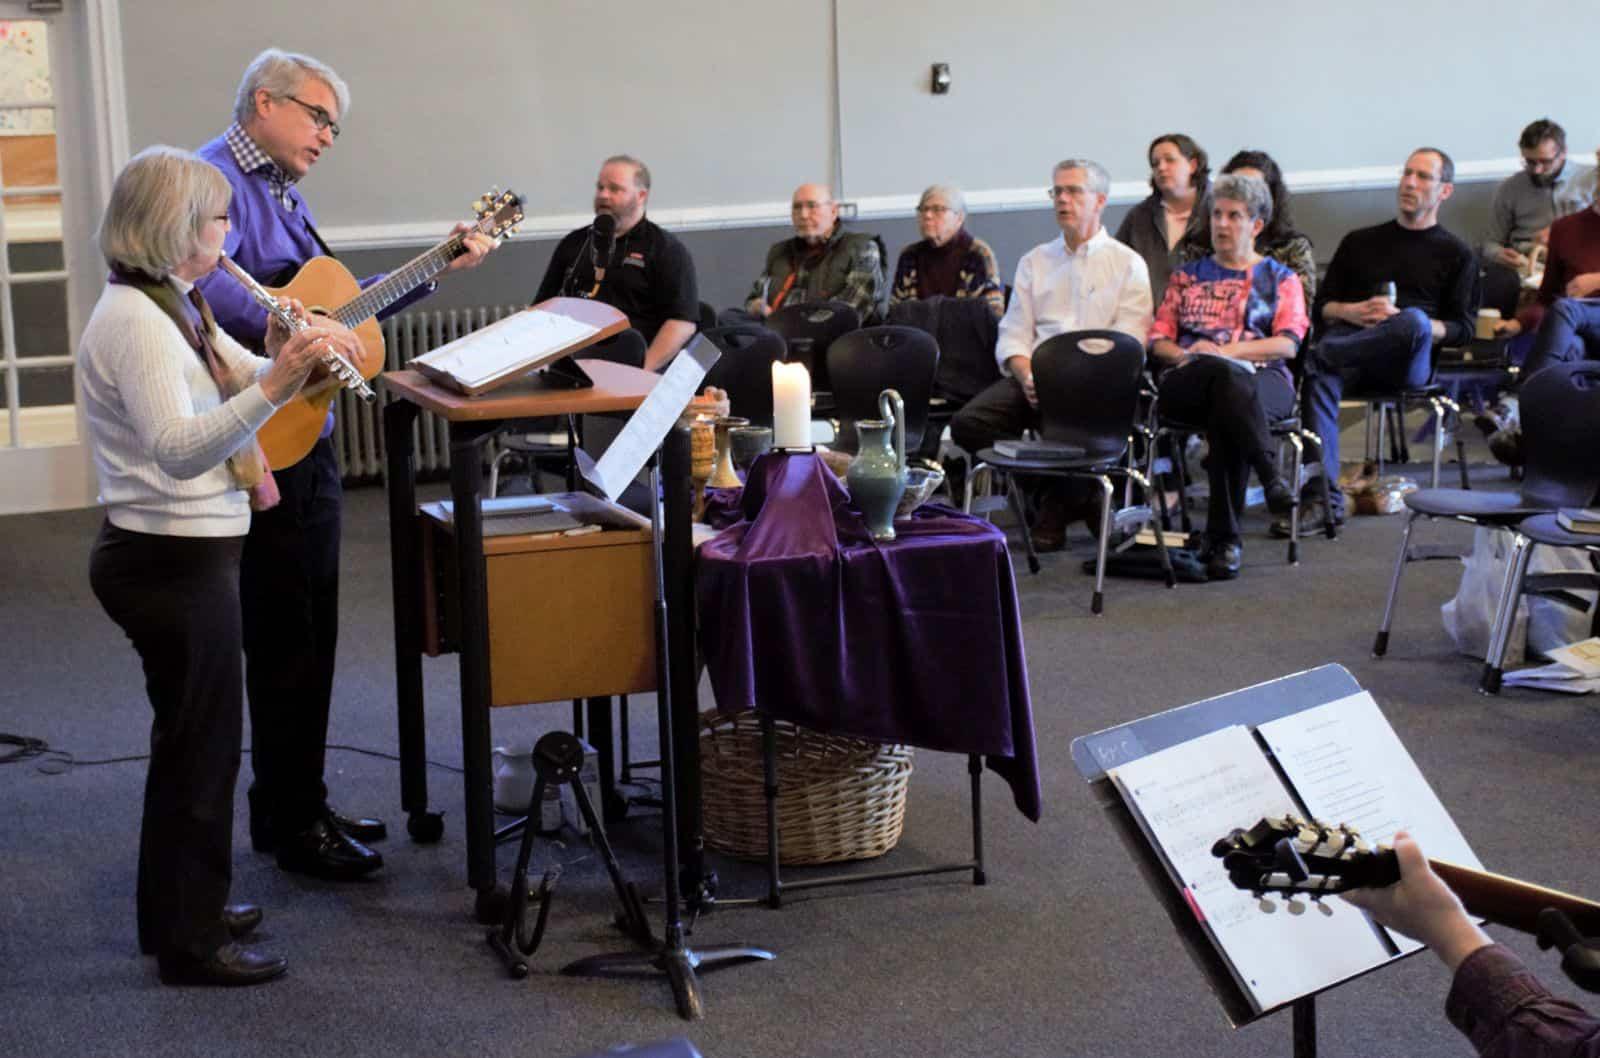 Congregational singing led by Rosene and David on Jan. 26, 2020